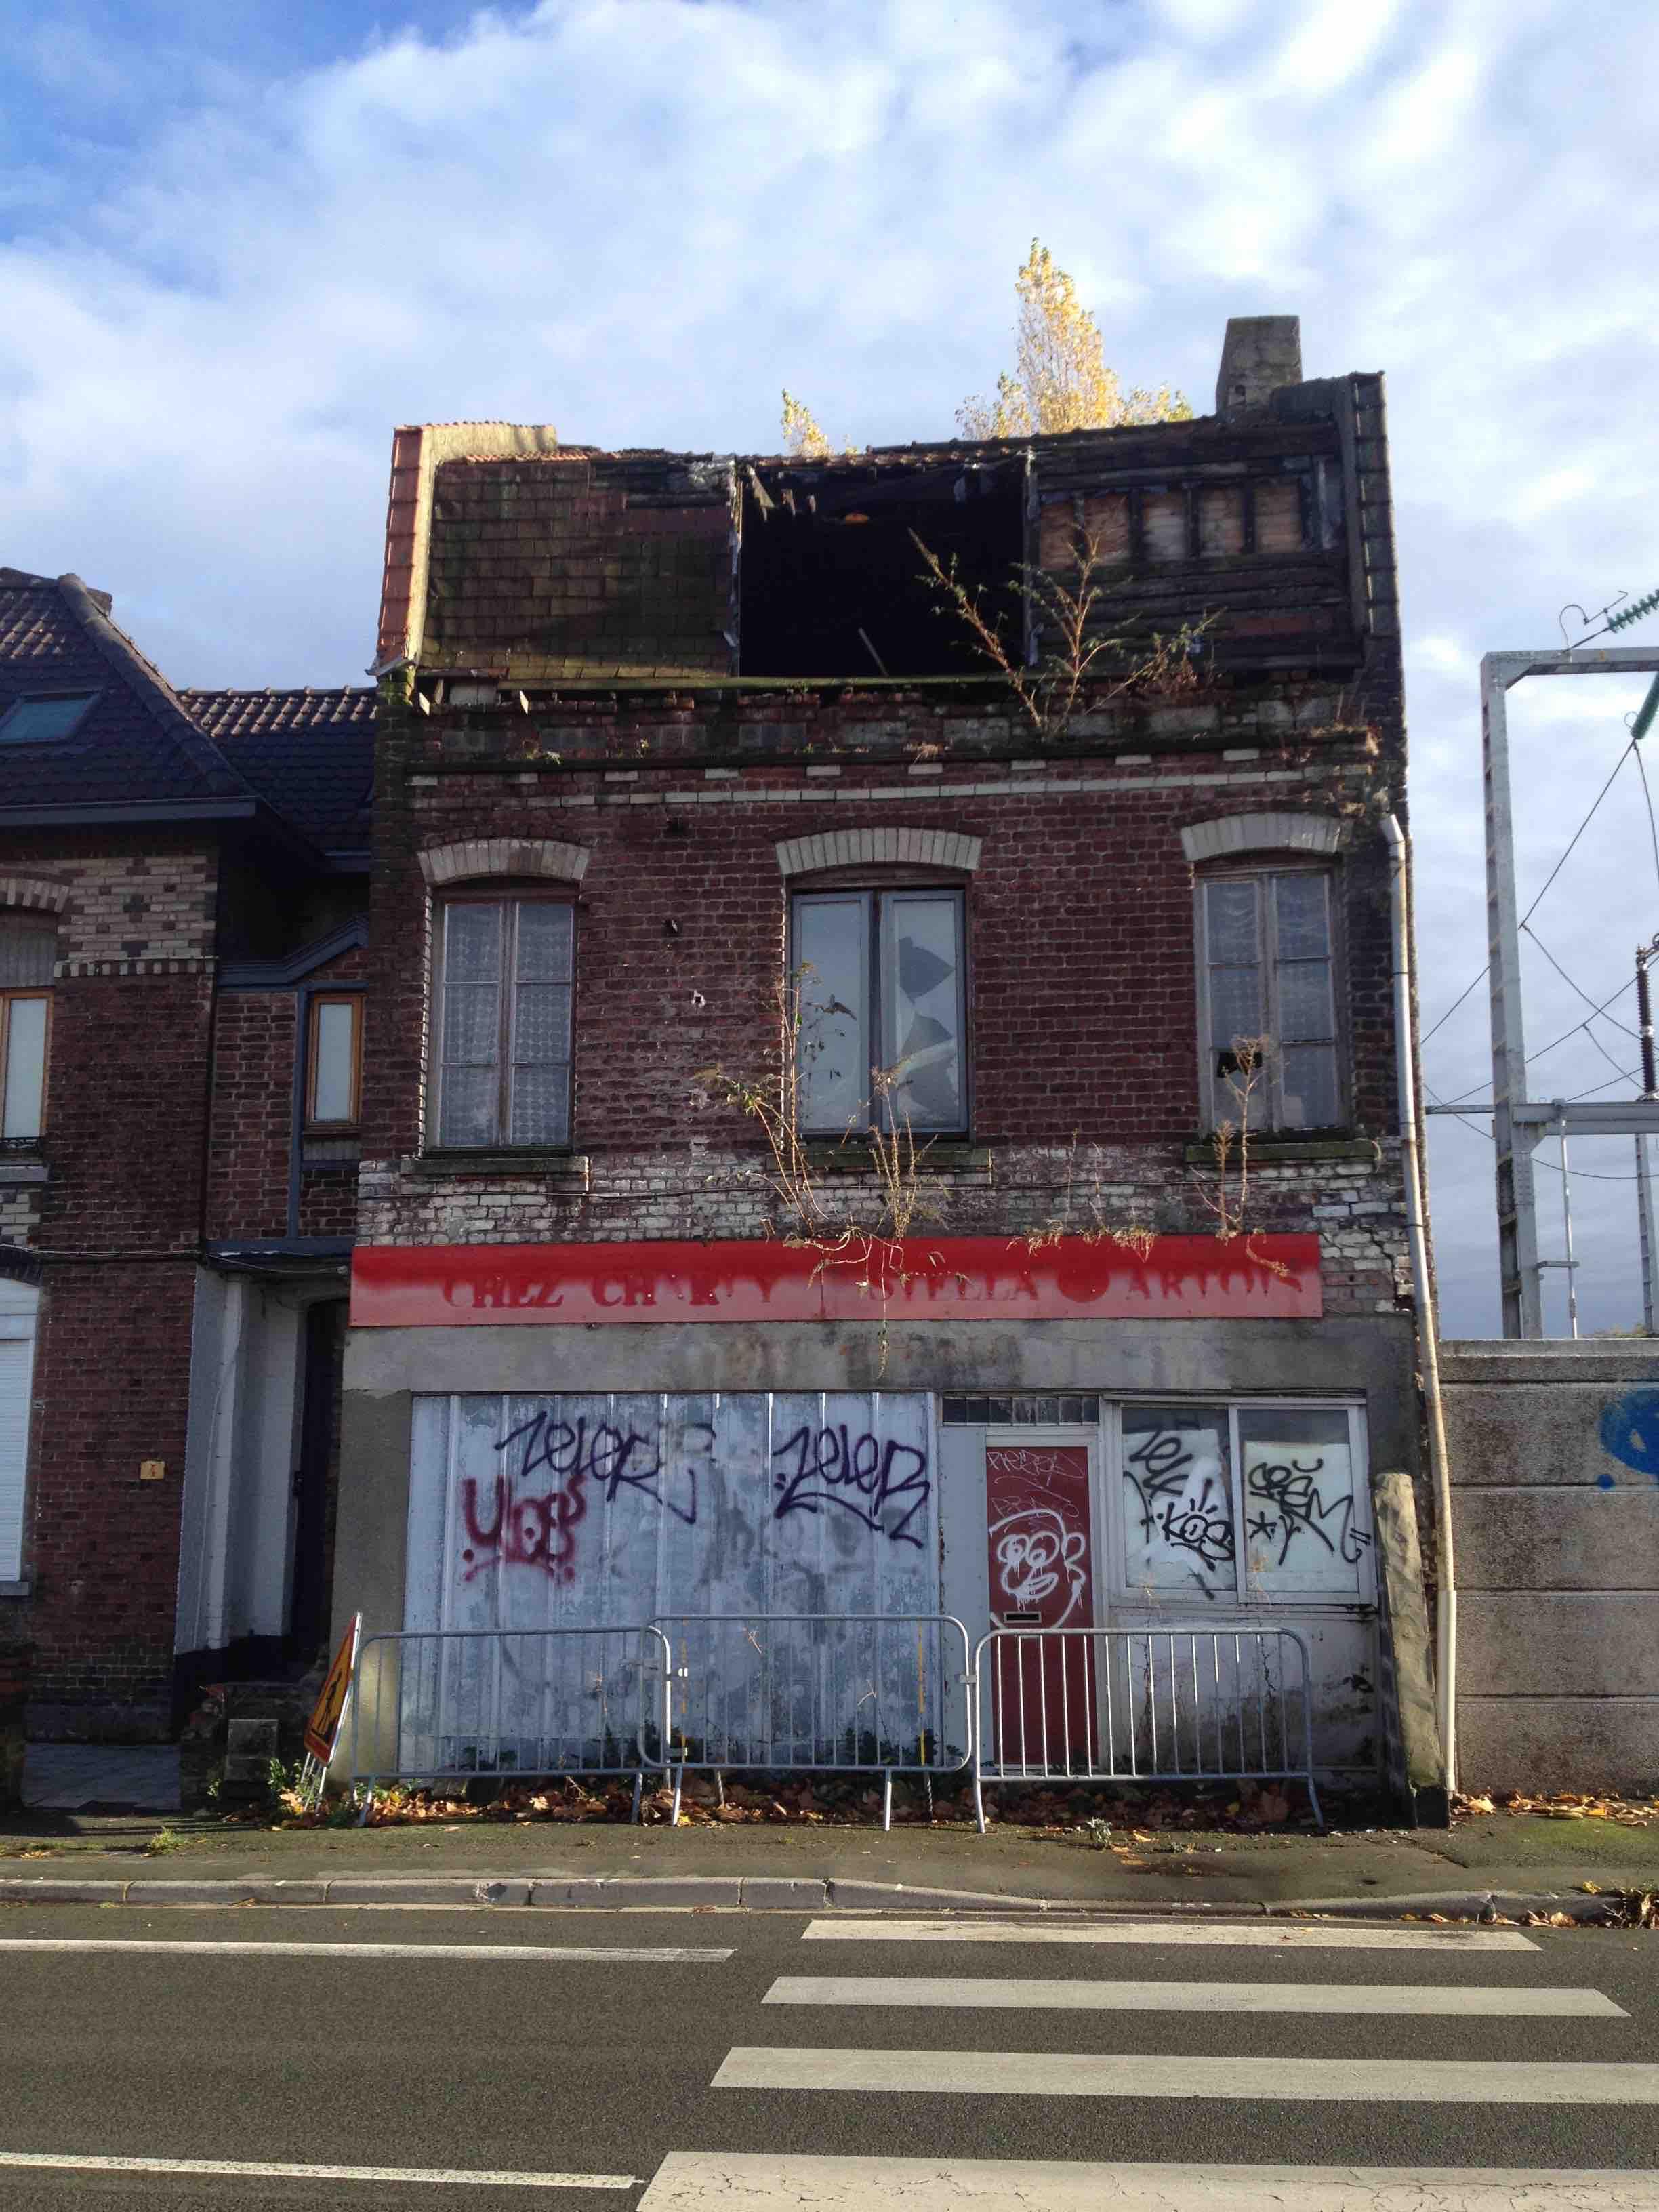 12/11/2018: Immeuble menaçant ruine à Wasquehal